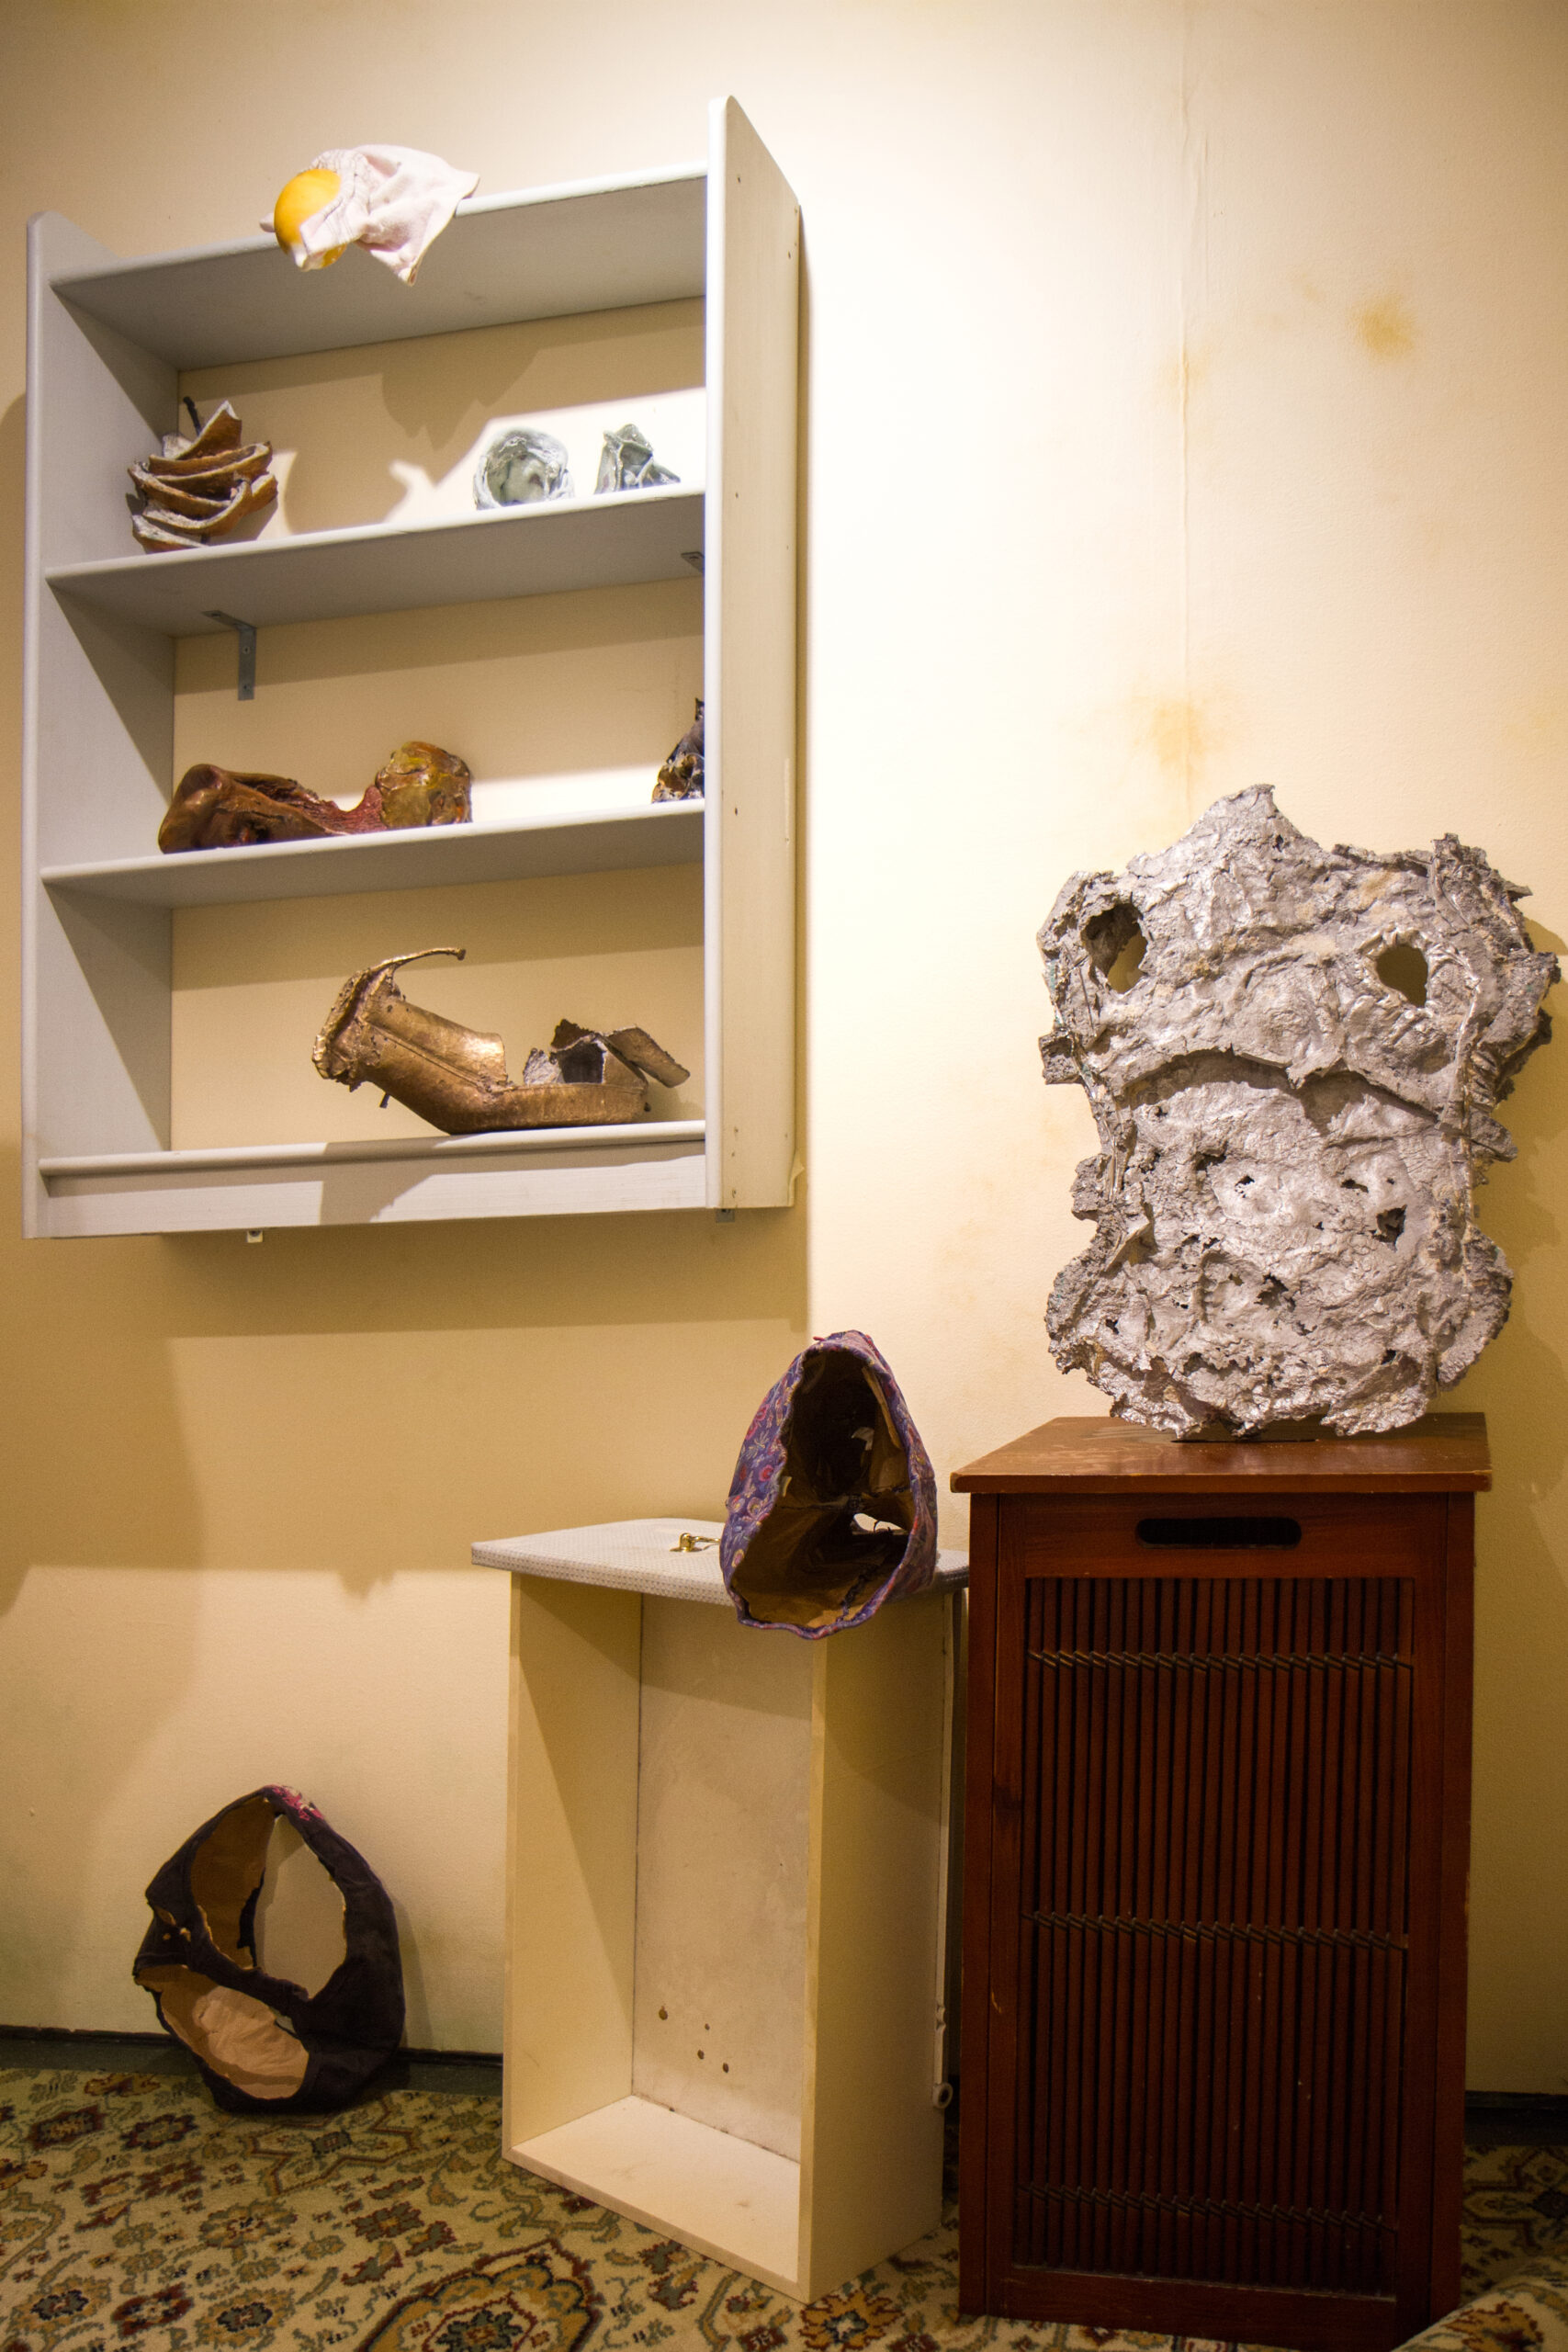 Lana Locke Making (Babies) at LUNGLEY Gallery 2020